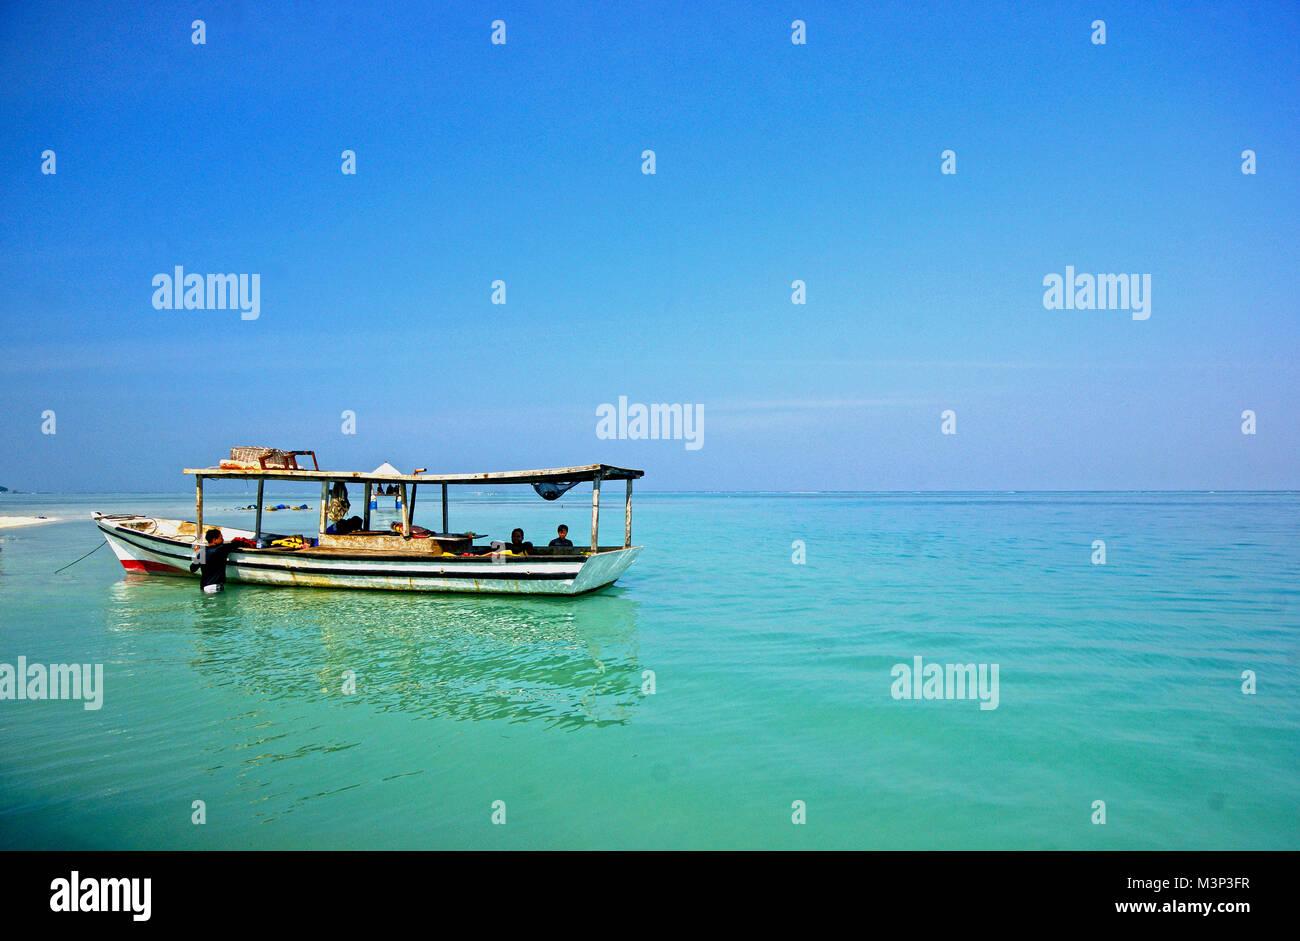 Indonesia Beach Boat Stock Photos Fun Dive Pramuka Island Kepulauan Seribu Jakarta Image